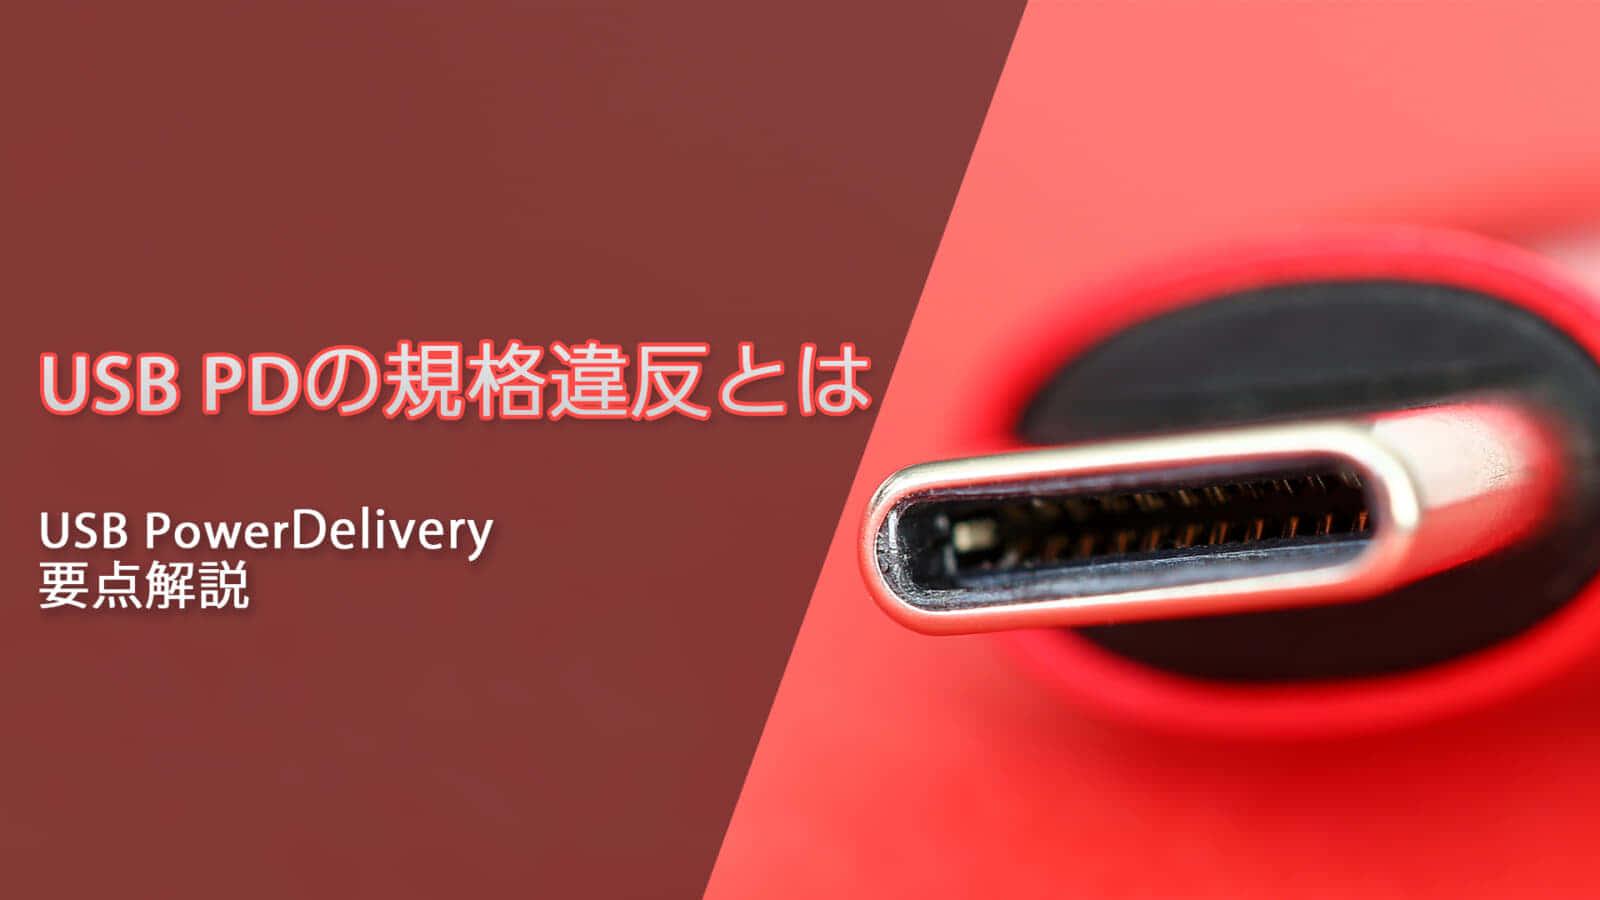 USB PDの規格(仕様)違反とは何か?問題点などを解説